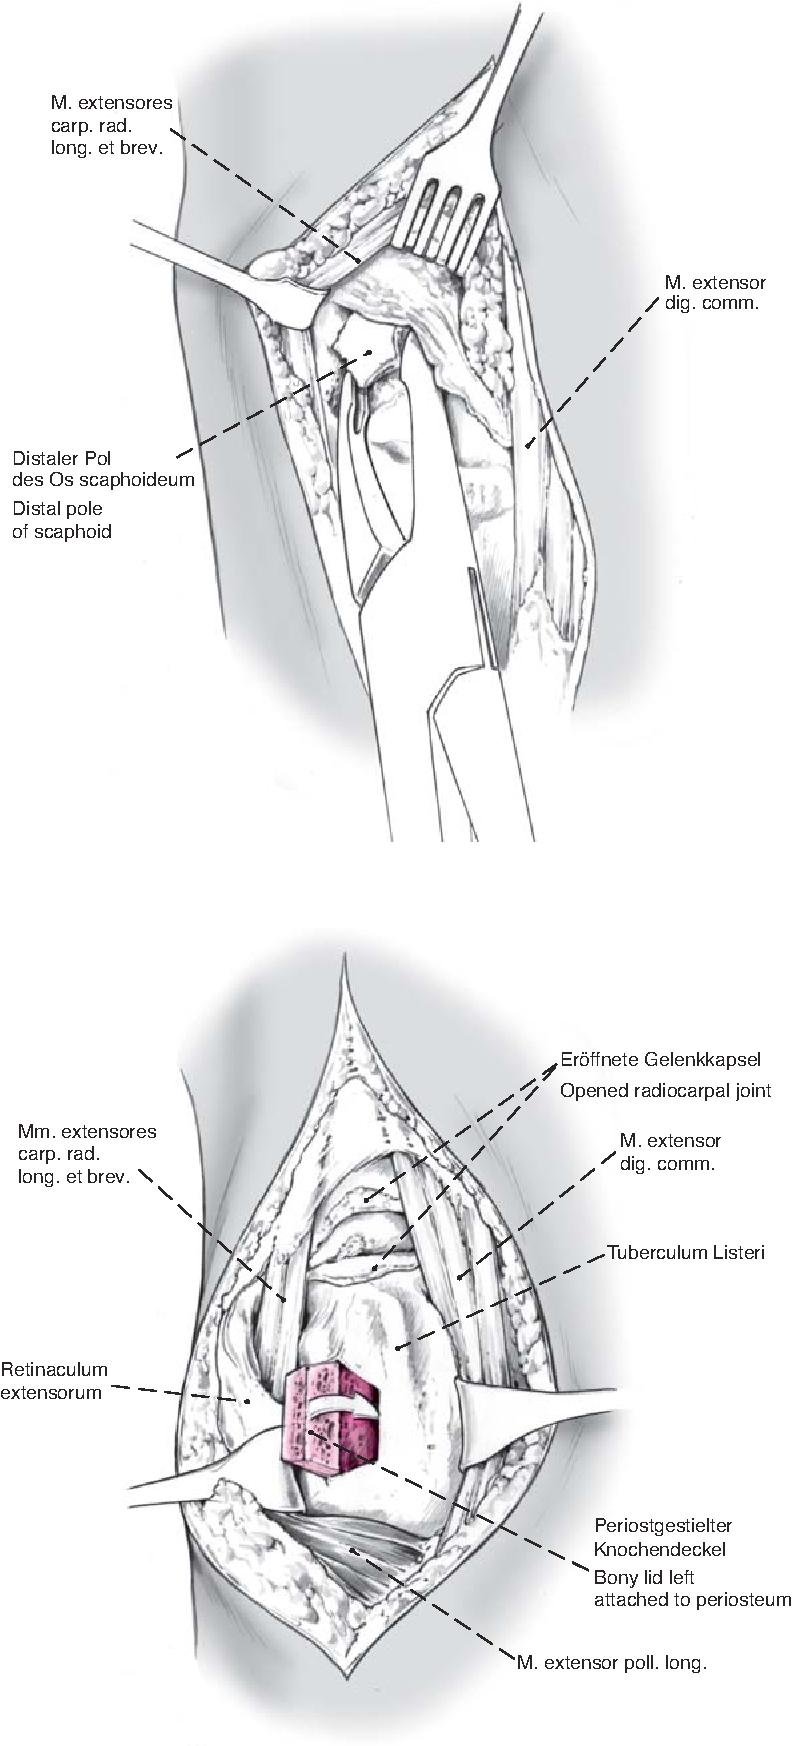 Nett Anatomie Referenzmodell Ideen - Anatomie Ideen - finotti.info